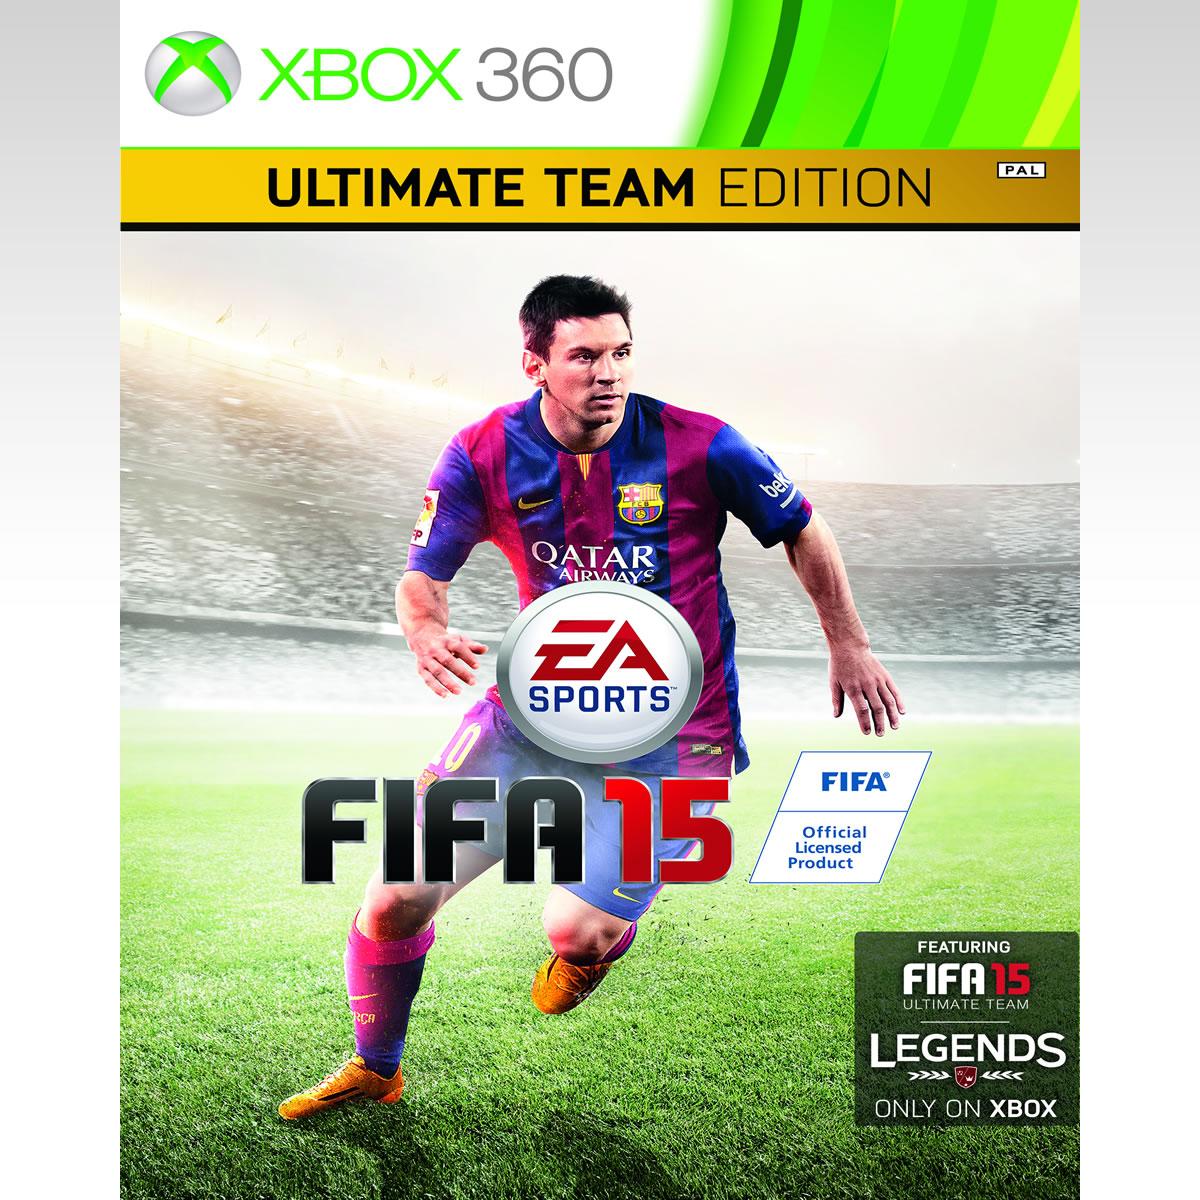 FIFA_15_XBOX_360_ULTIMATE_TEAM_EDITION_thumb.jpg